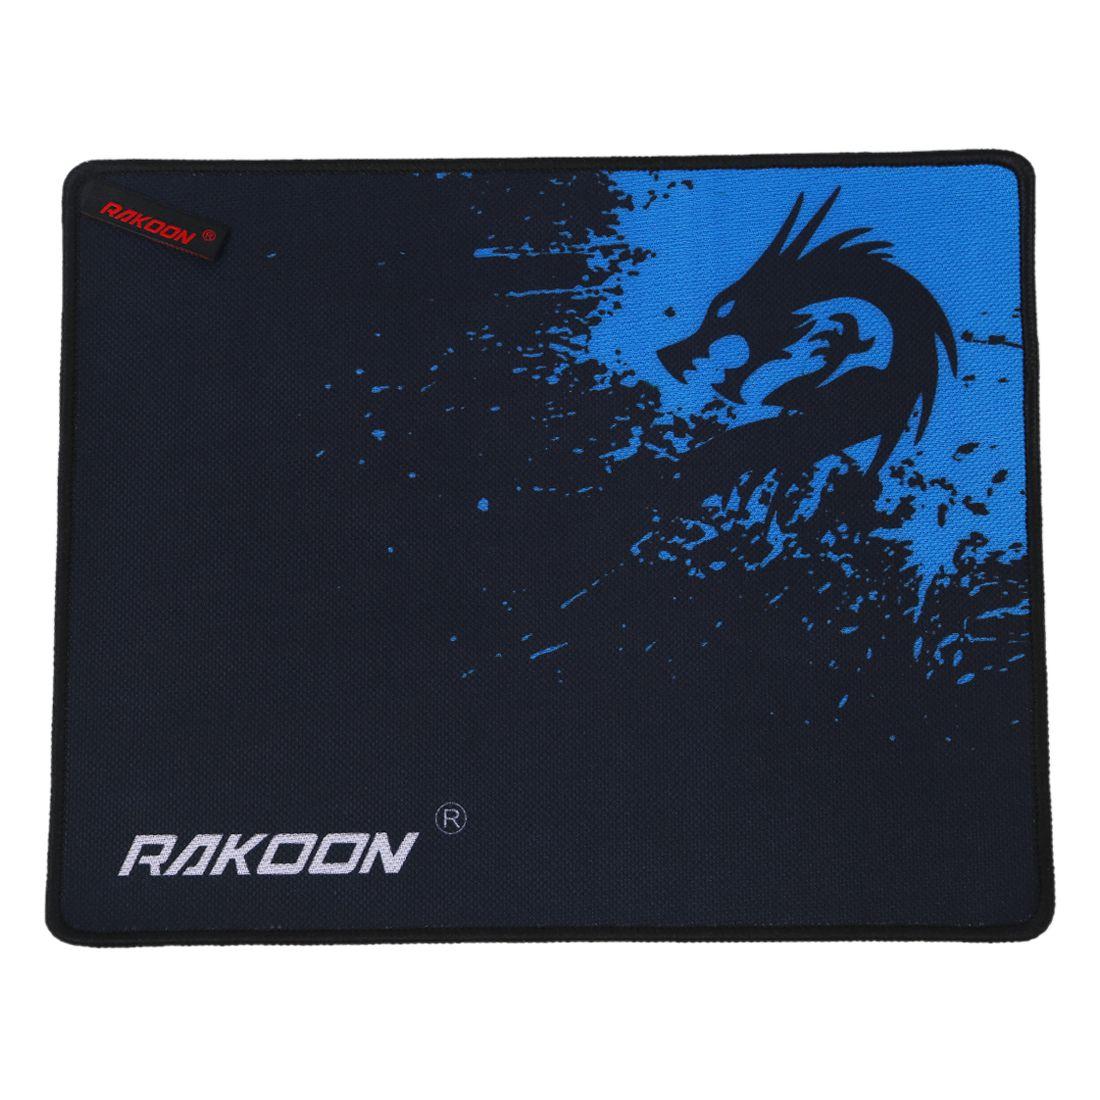 RAKOON Xinlong Large Gaming Locking Edge Mouse Mat For Internet Bar Mouse Pad(Control Blue 25*30CM)